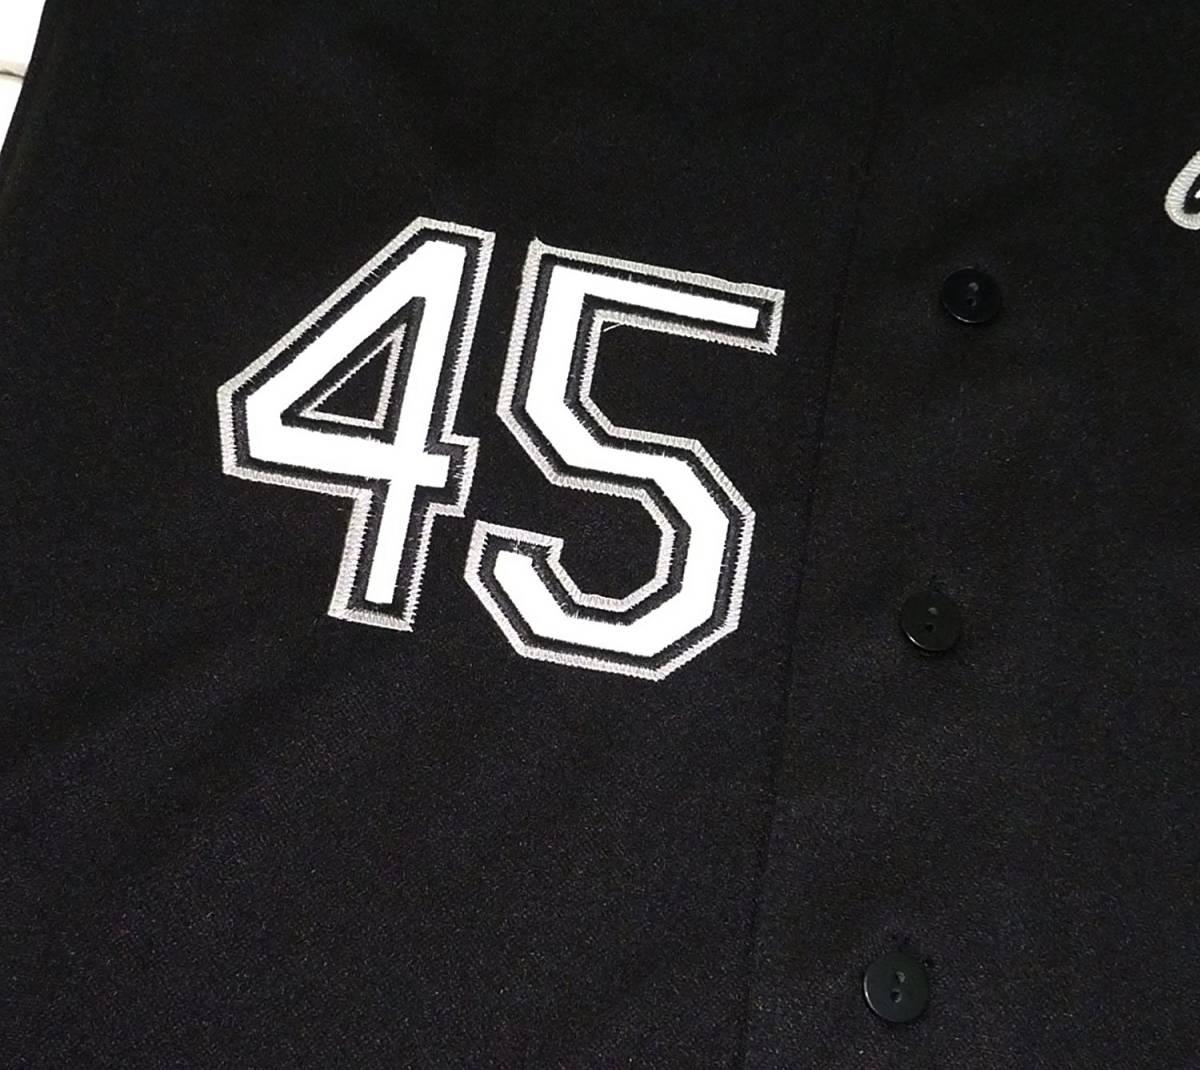 Majestic マジェスティック クーパースタウン マイケル ジョーダン ホワイト ソックス ベースボールシャツ(ブラック)(L)【並行輸入品】 _画像4